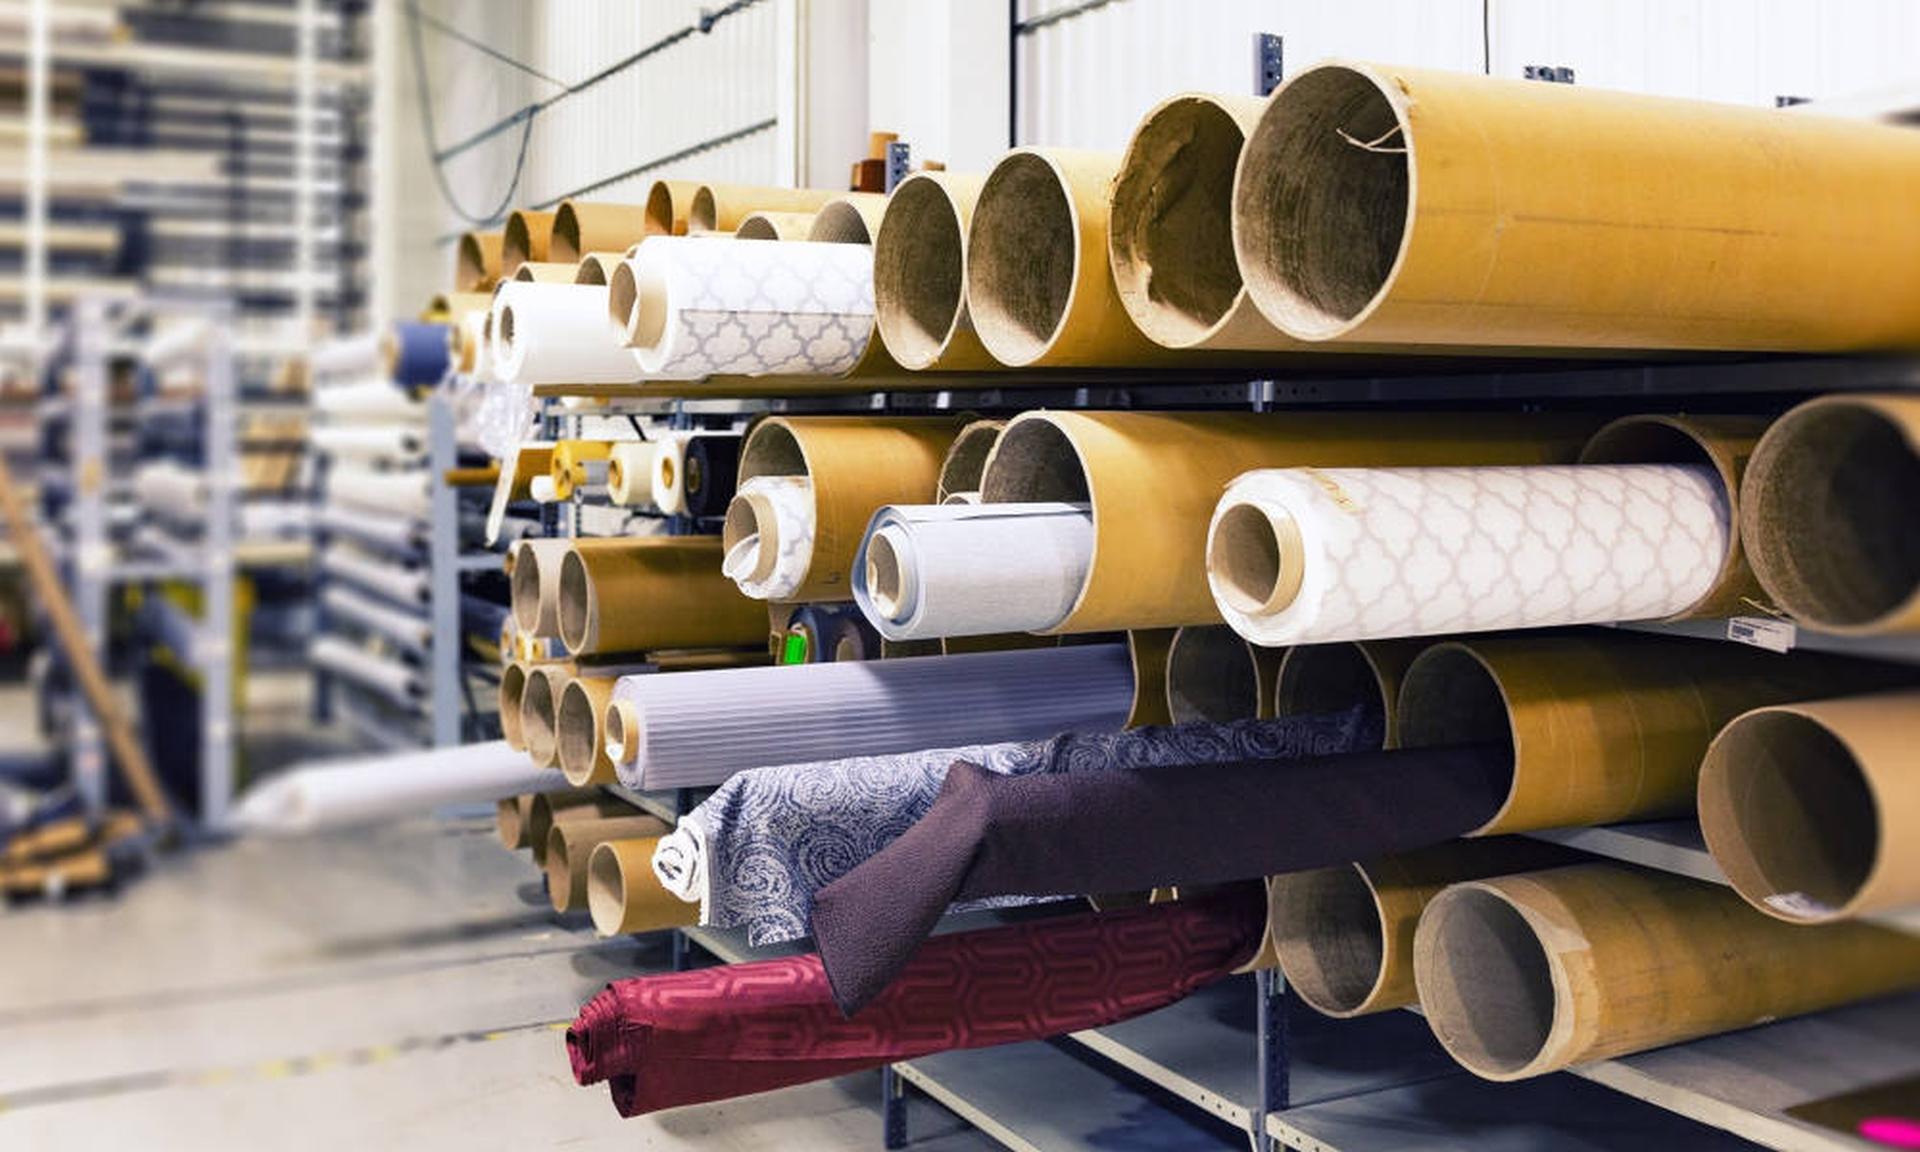 Etichette settore manifatturiero